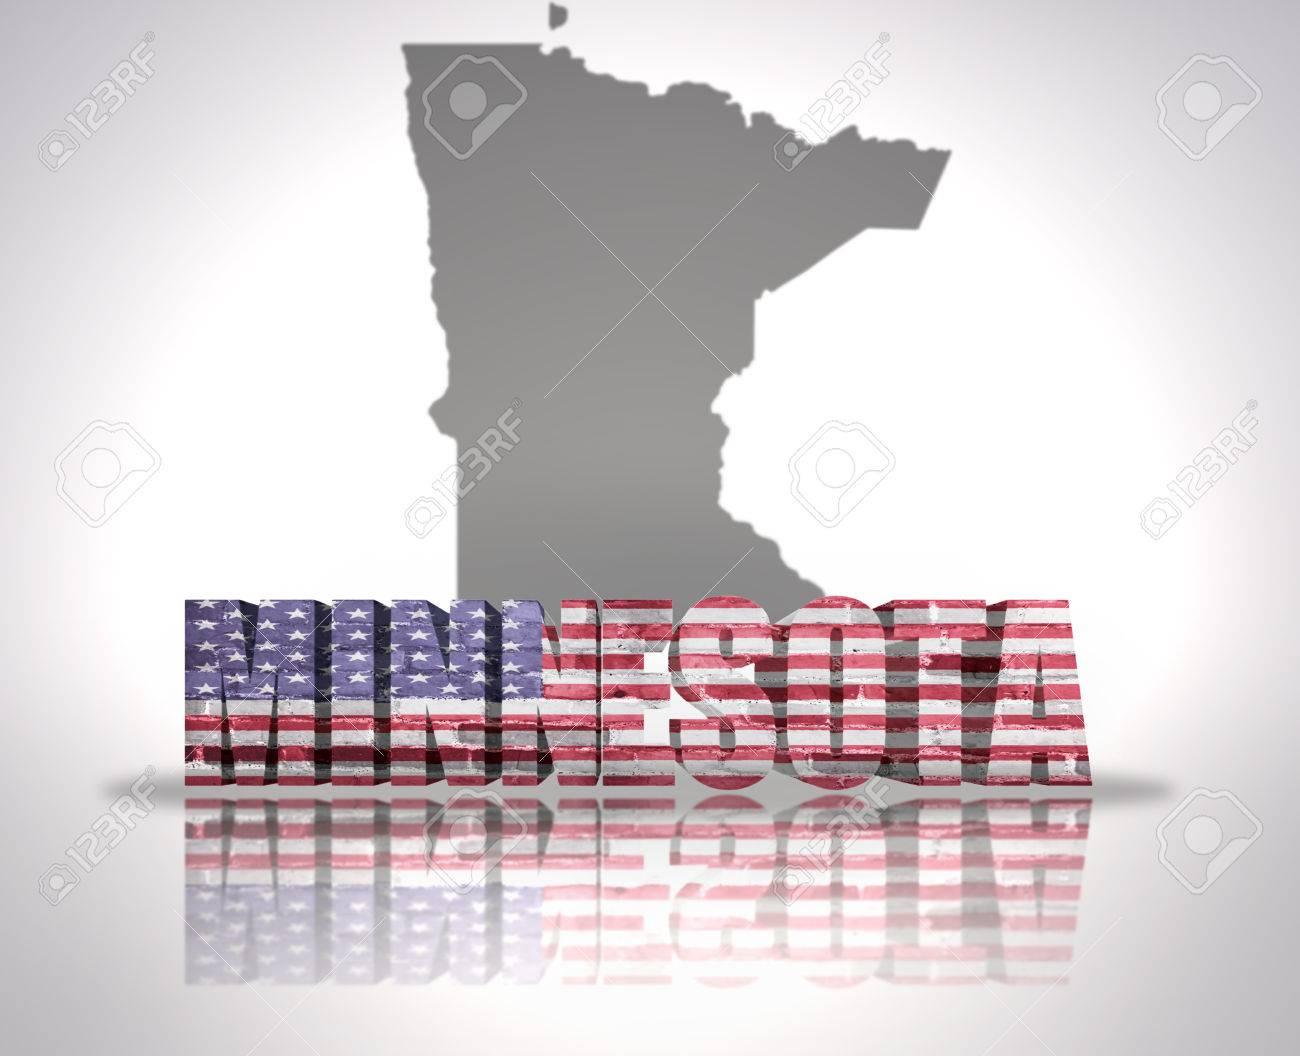 Minnesota State Map Minnesota On Us Map Minnesota Map Minnesota - Minnesota in us map